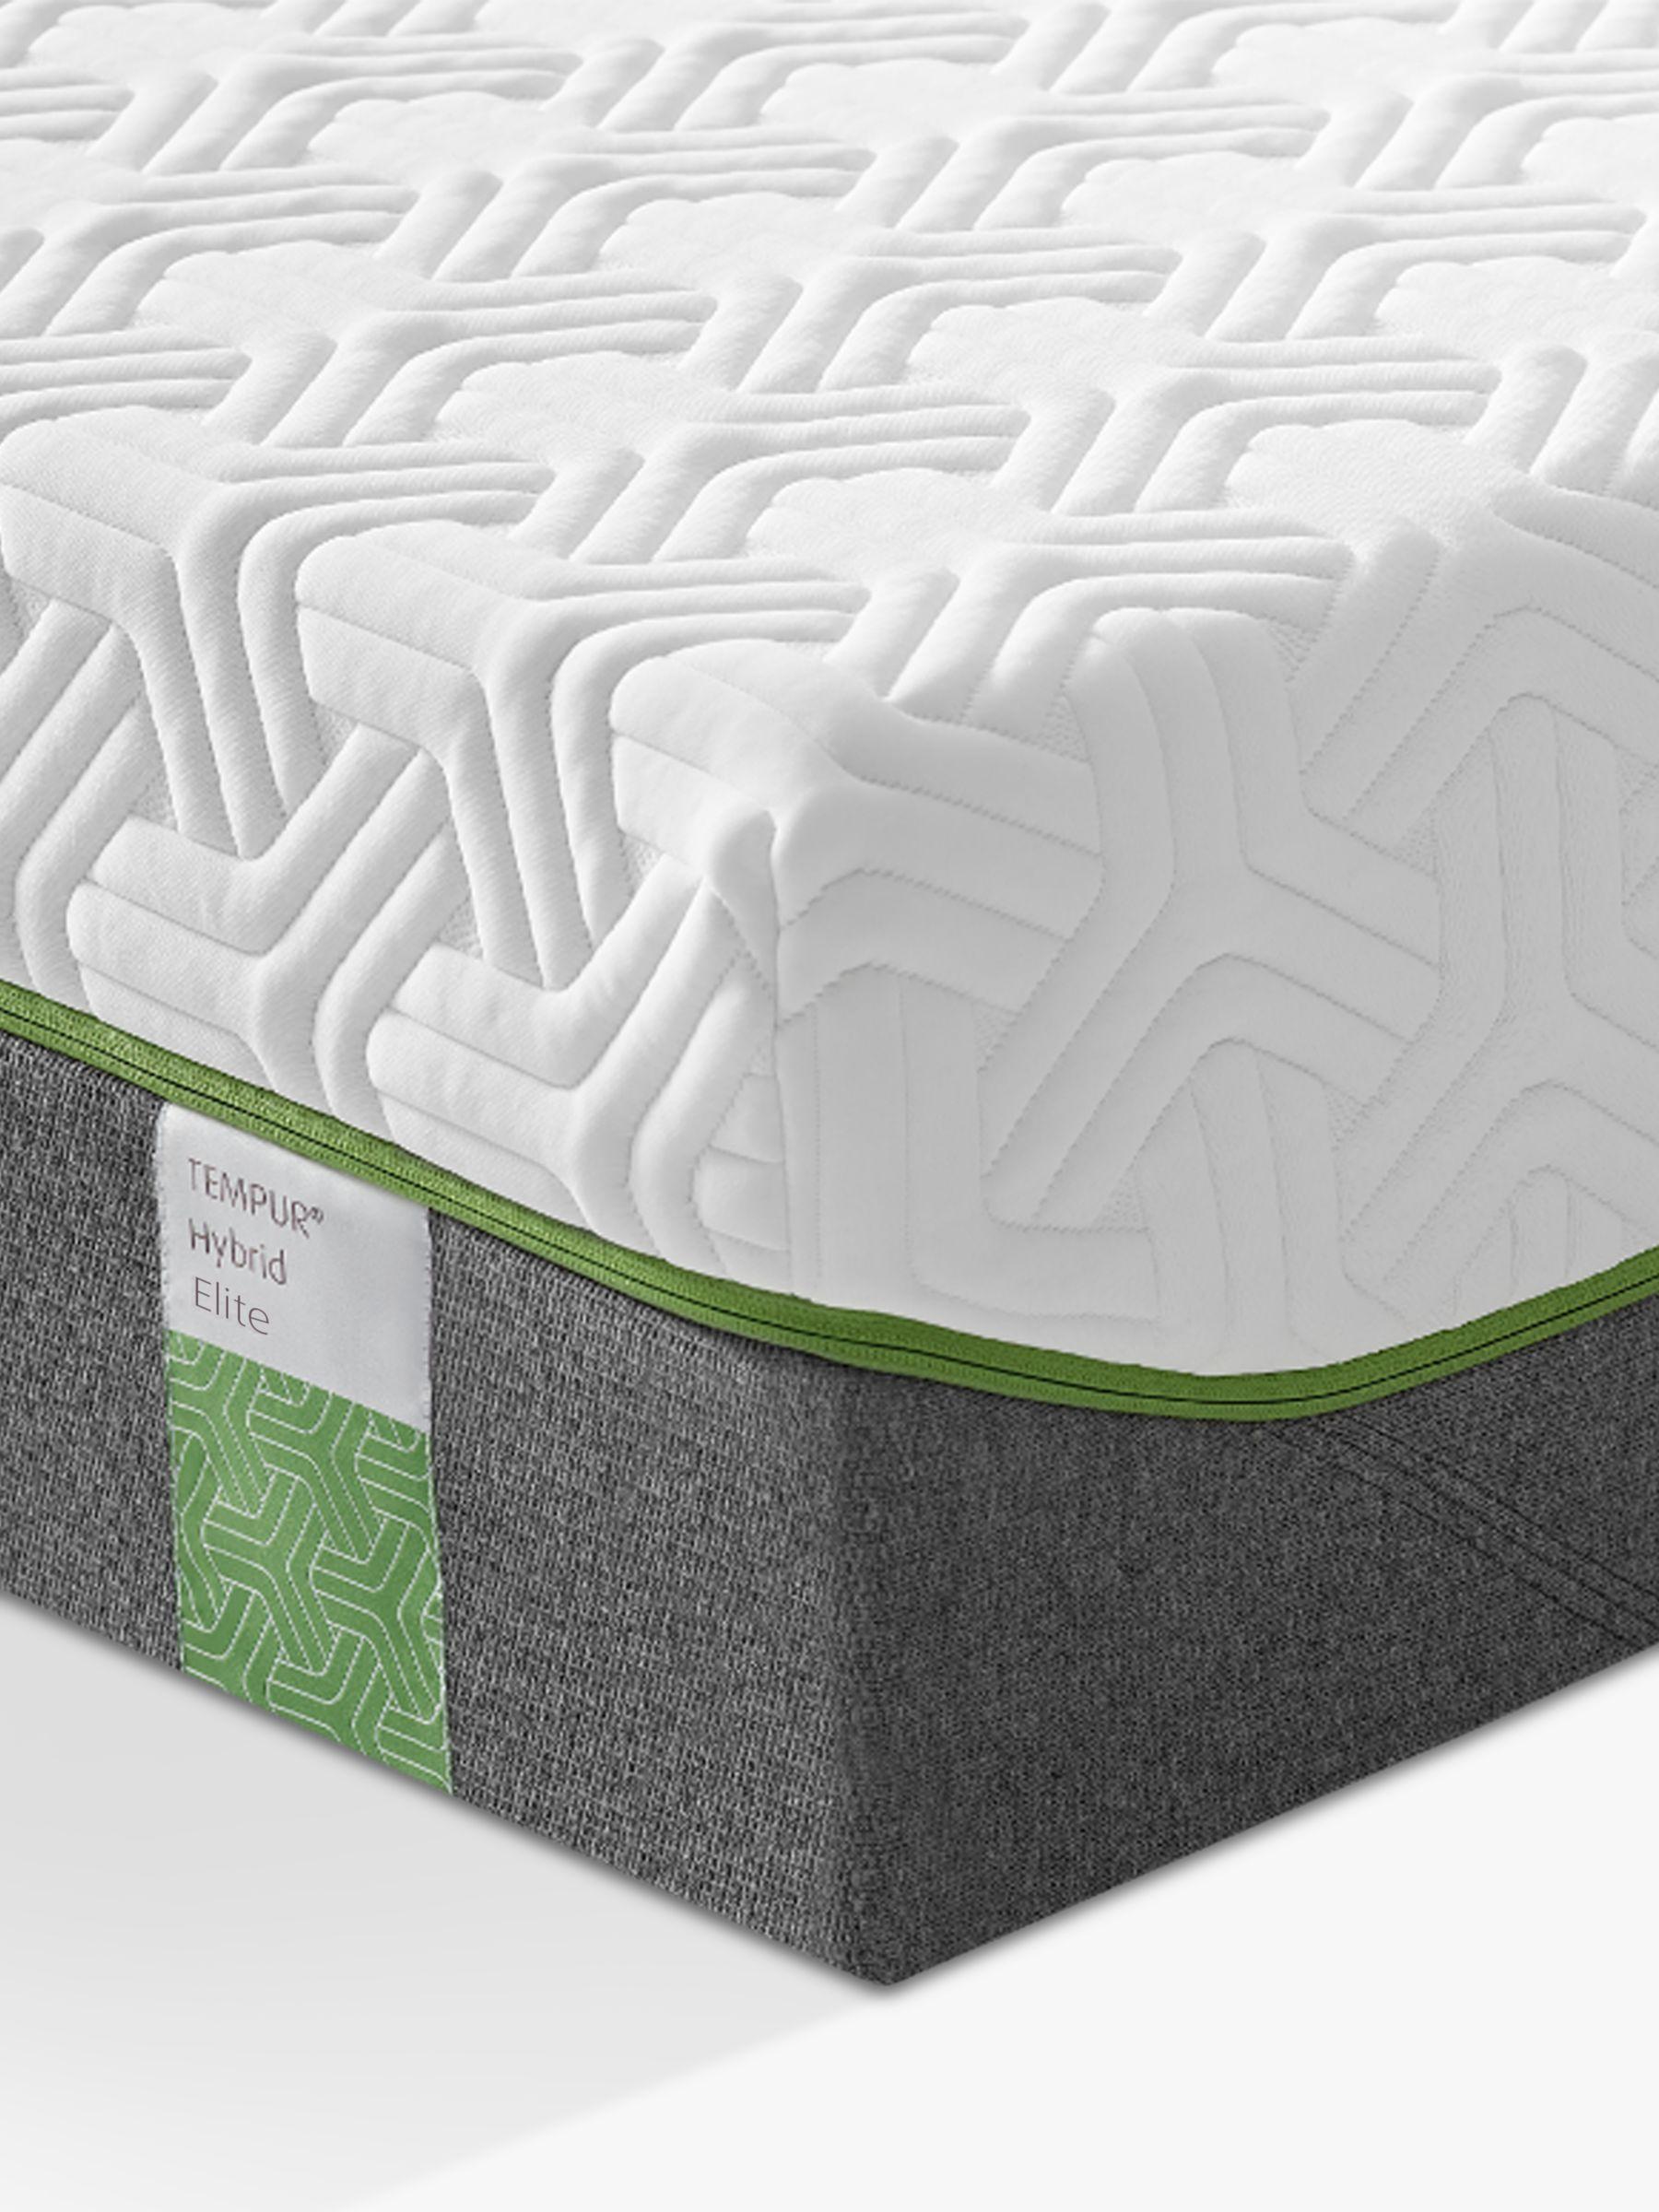 Tempur Tempur Hybrid Elite Pocket Spring Memory Foam Mattress, Small Double